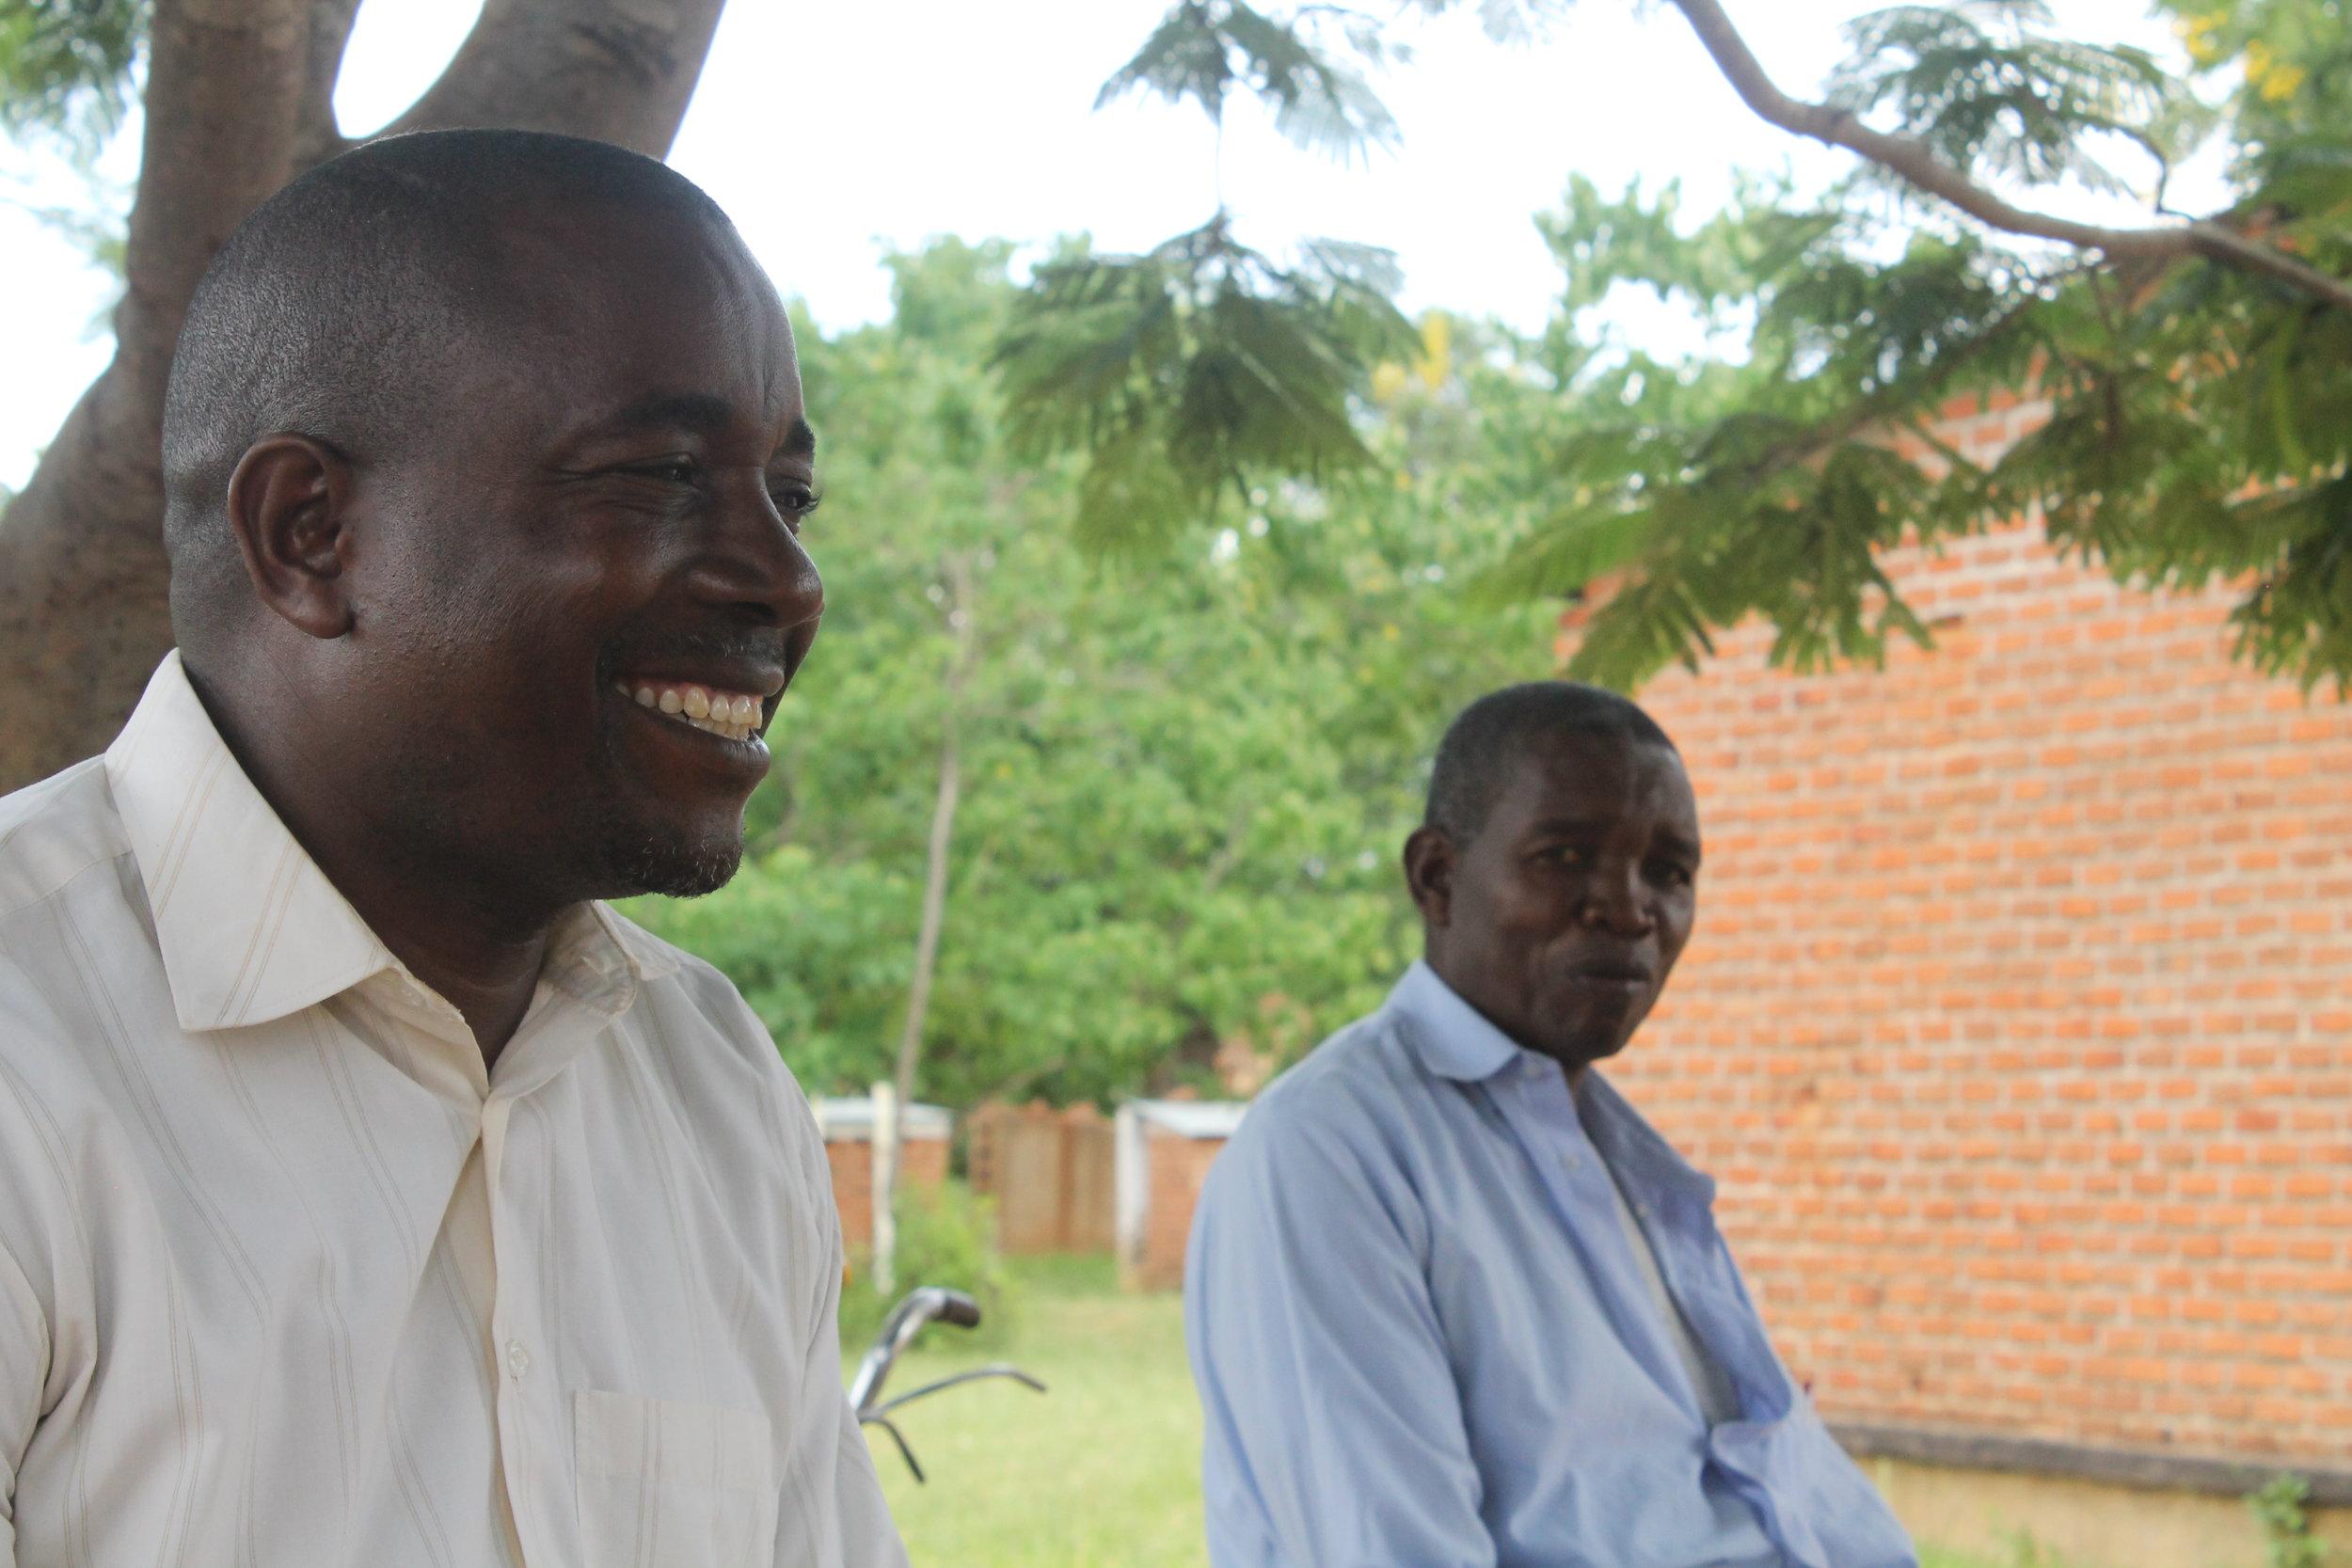 Mr. Aaron Mulabu, Story Time Representative for AY 2017-2018